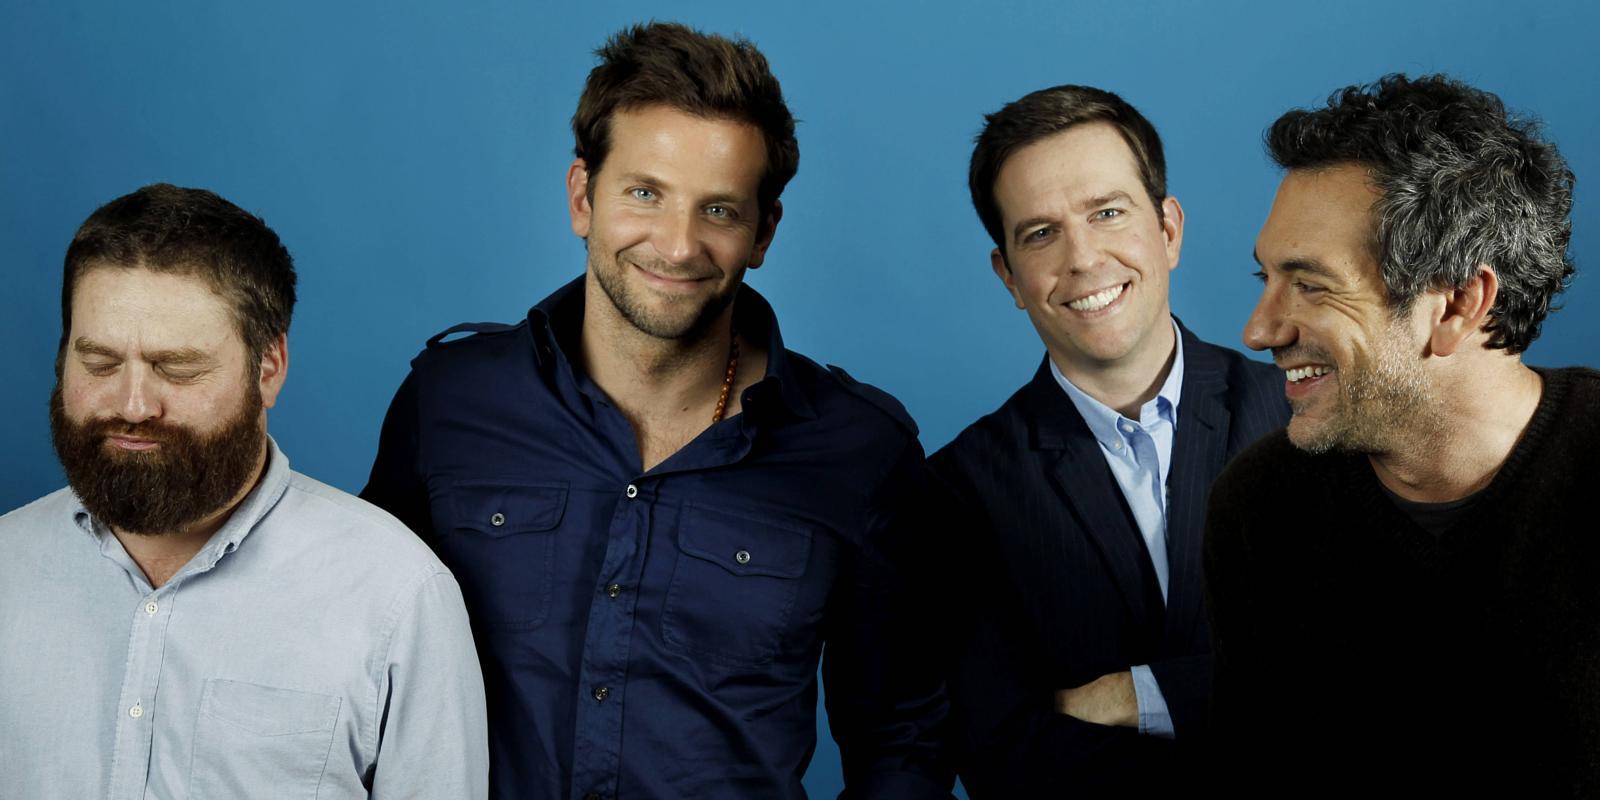 Bradley Cooper, Ed Helms: \'The Hangover Part 4 won\'t happen\'